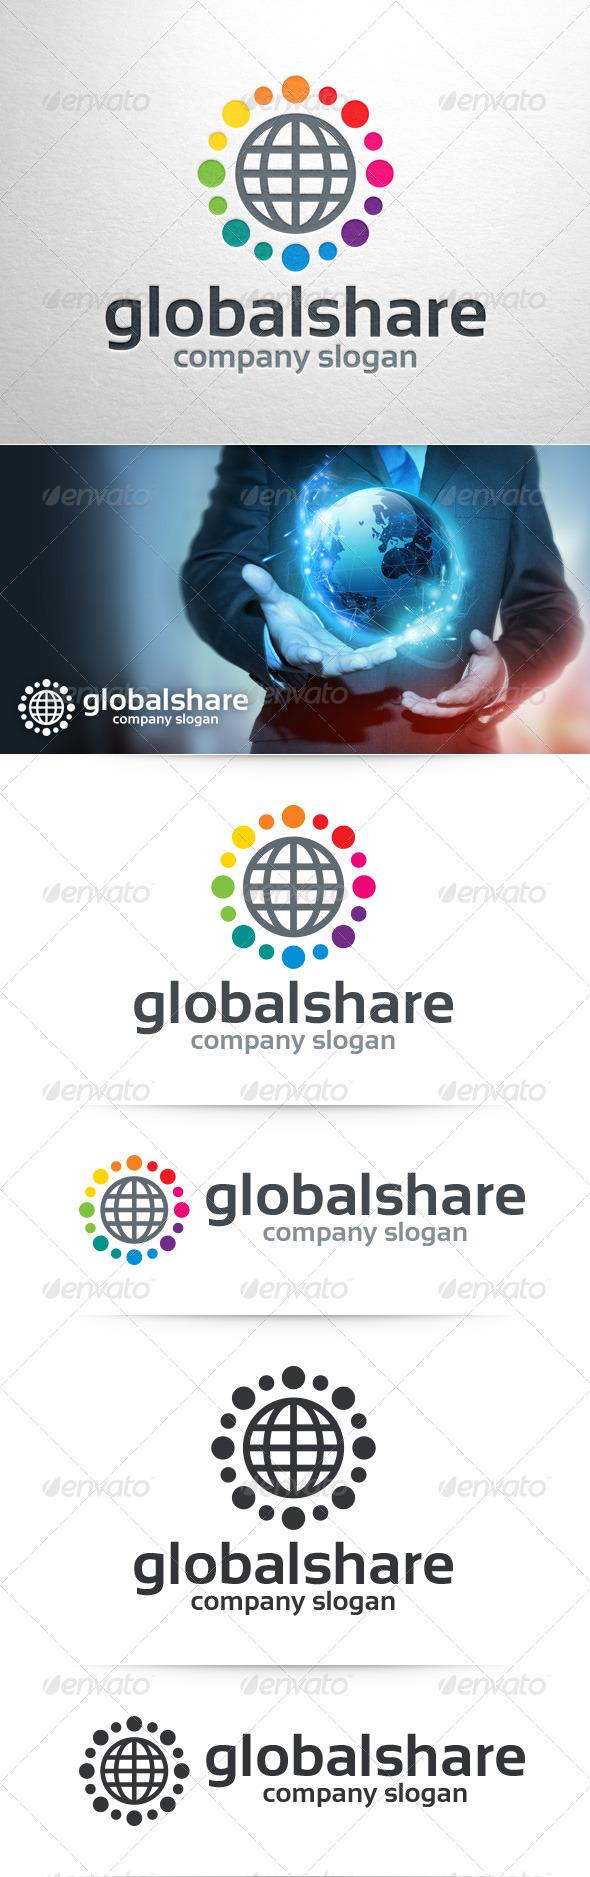 GraphicRiver Global Share Logo Template 8434084